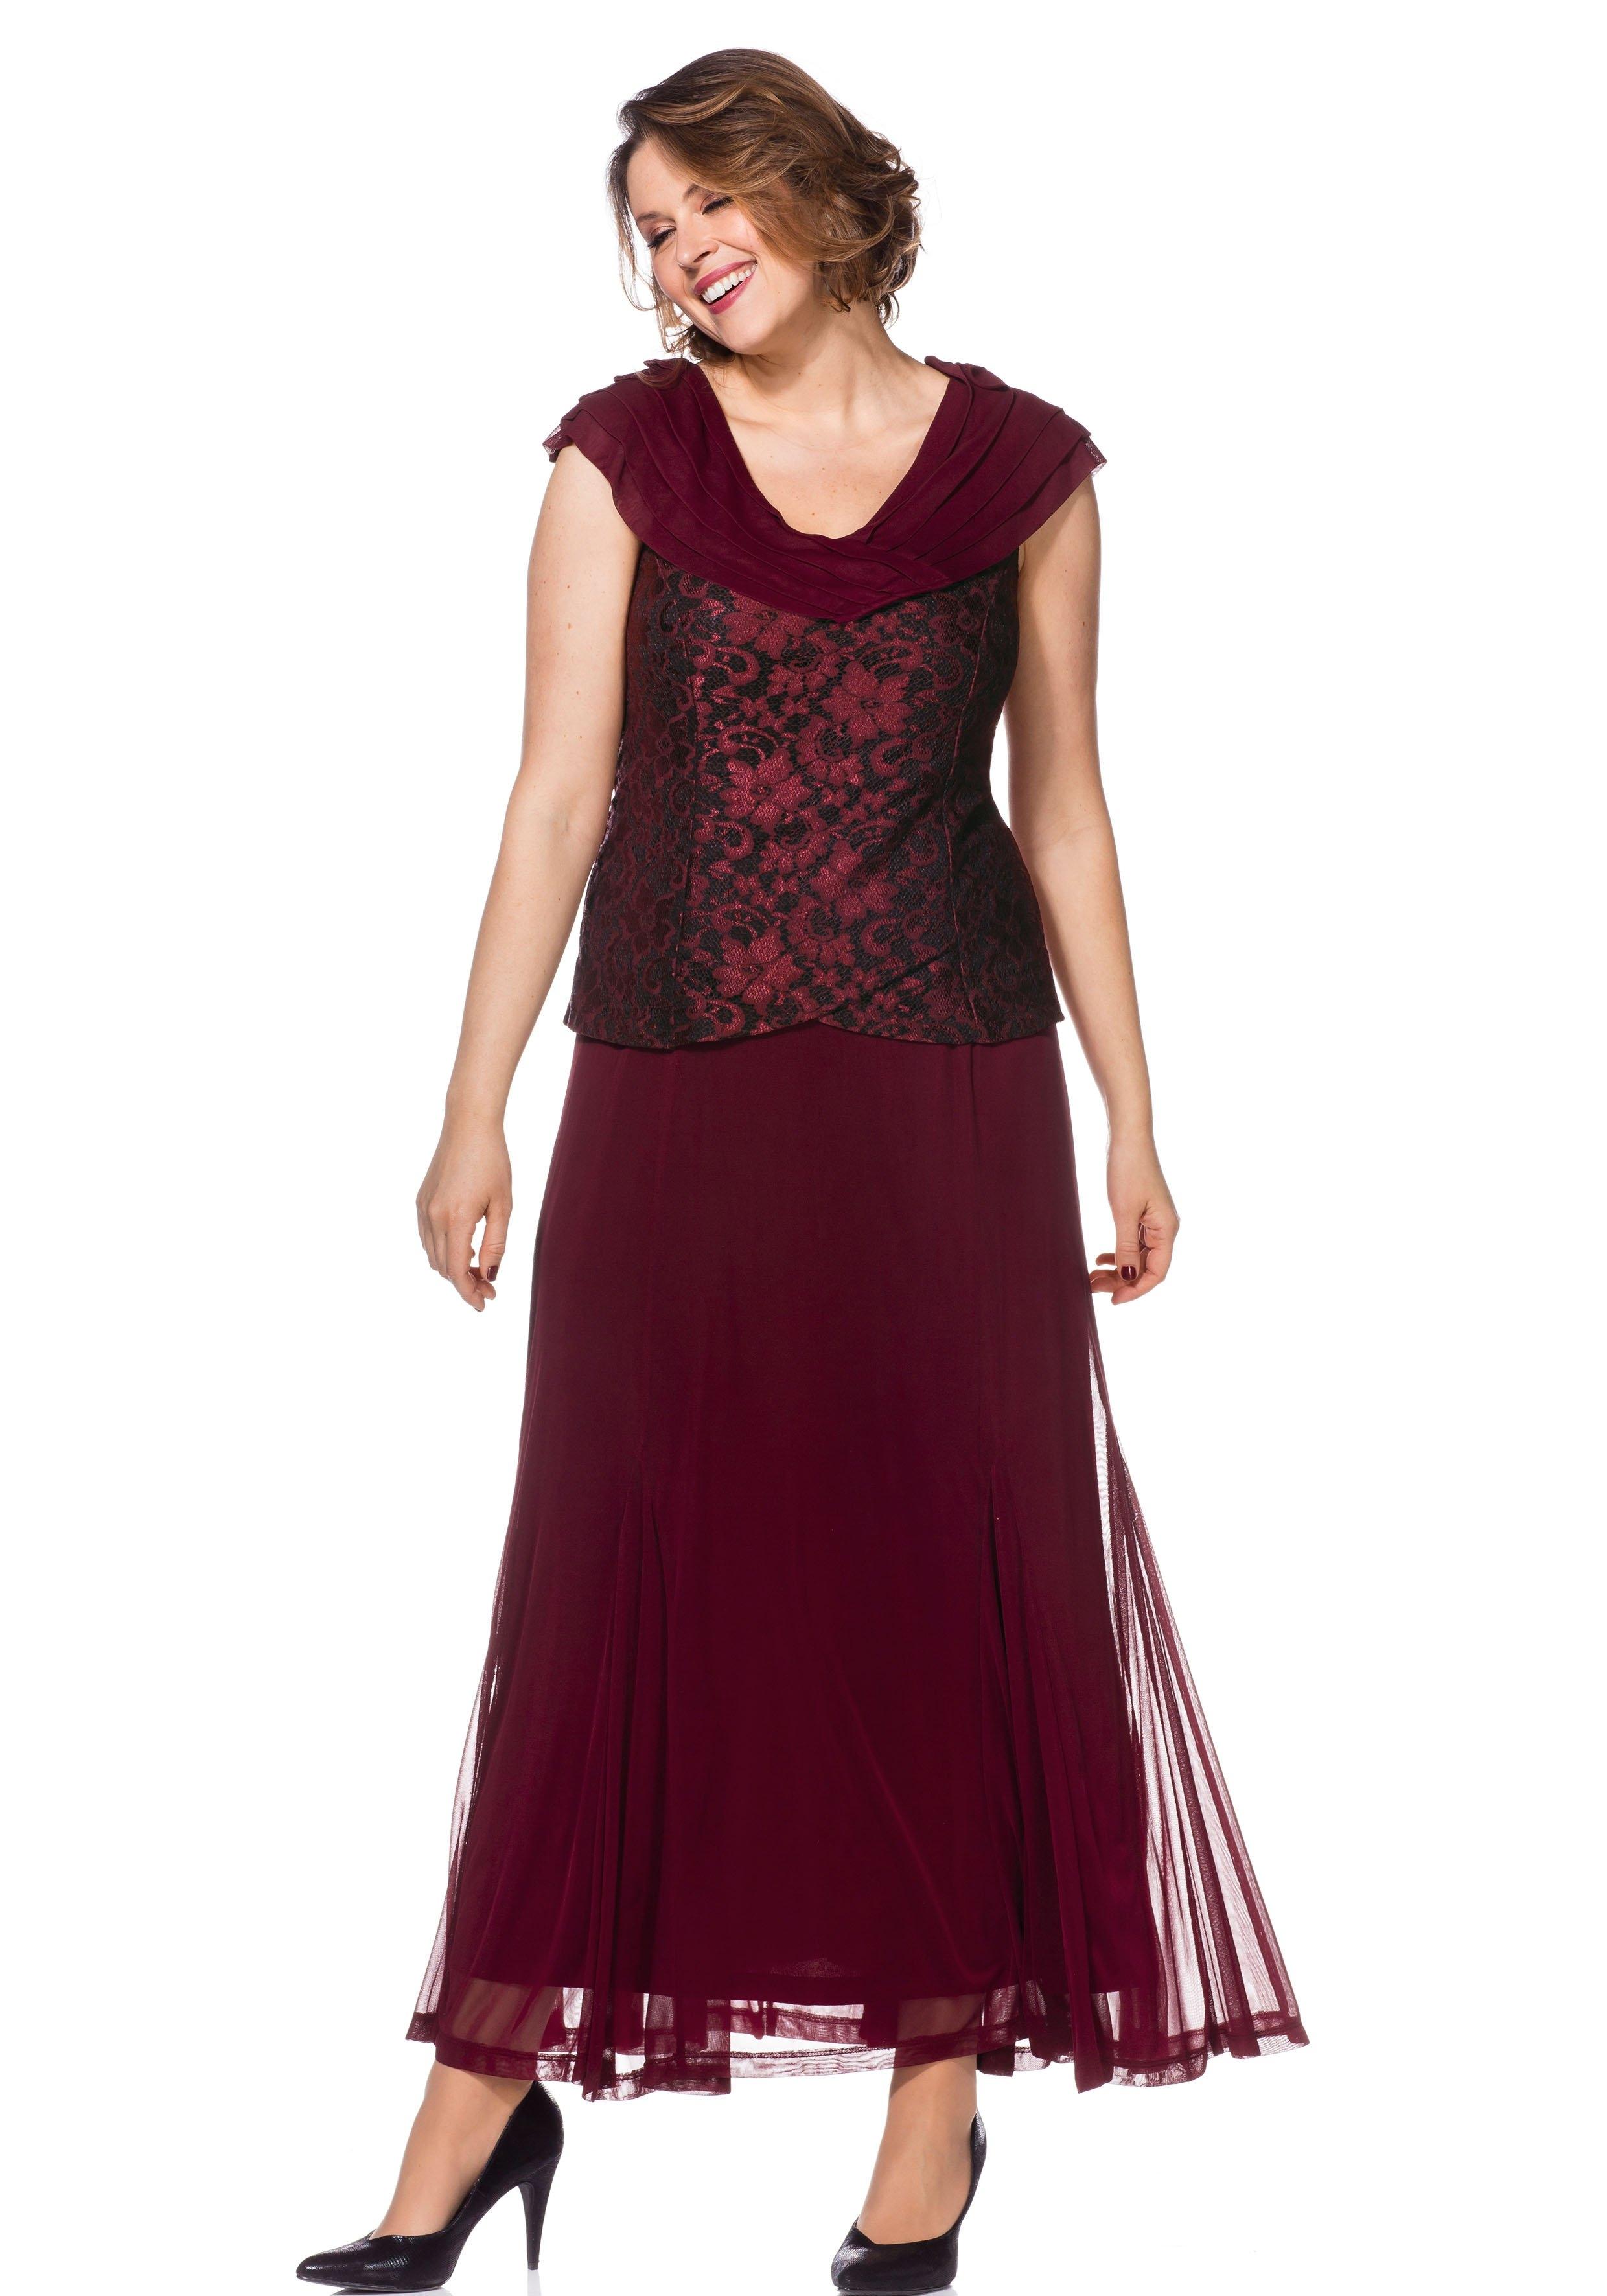 sheego style sheego style jurk online shoppen otto. Black Bedroom Furniture Sets. Home Design Ideas